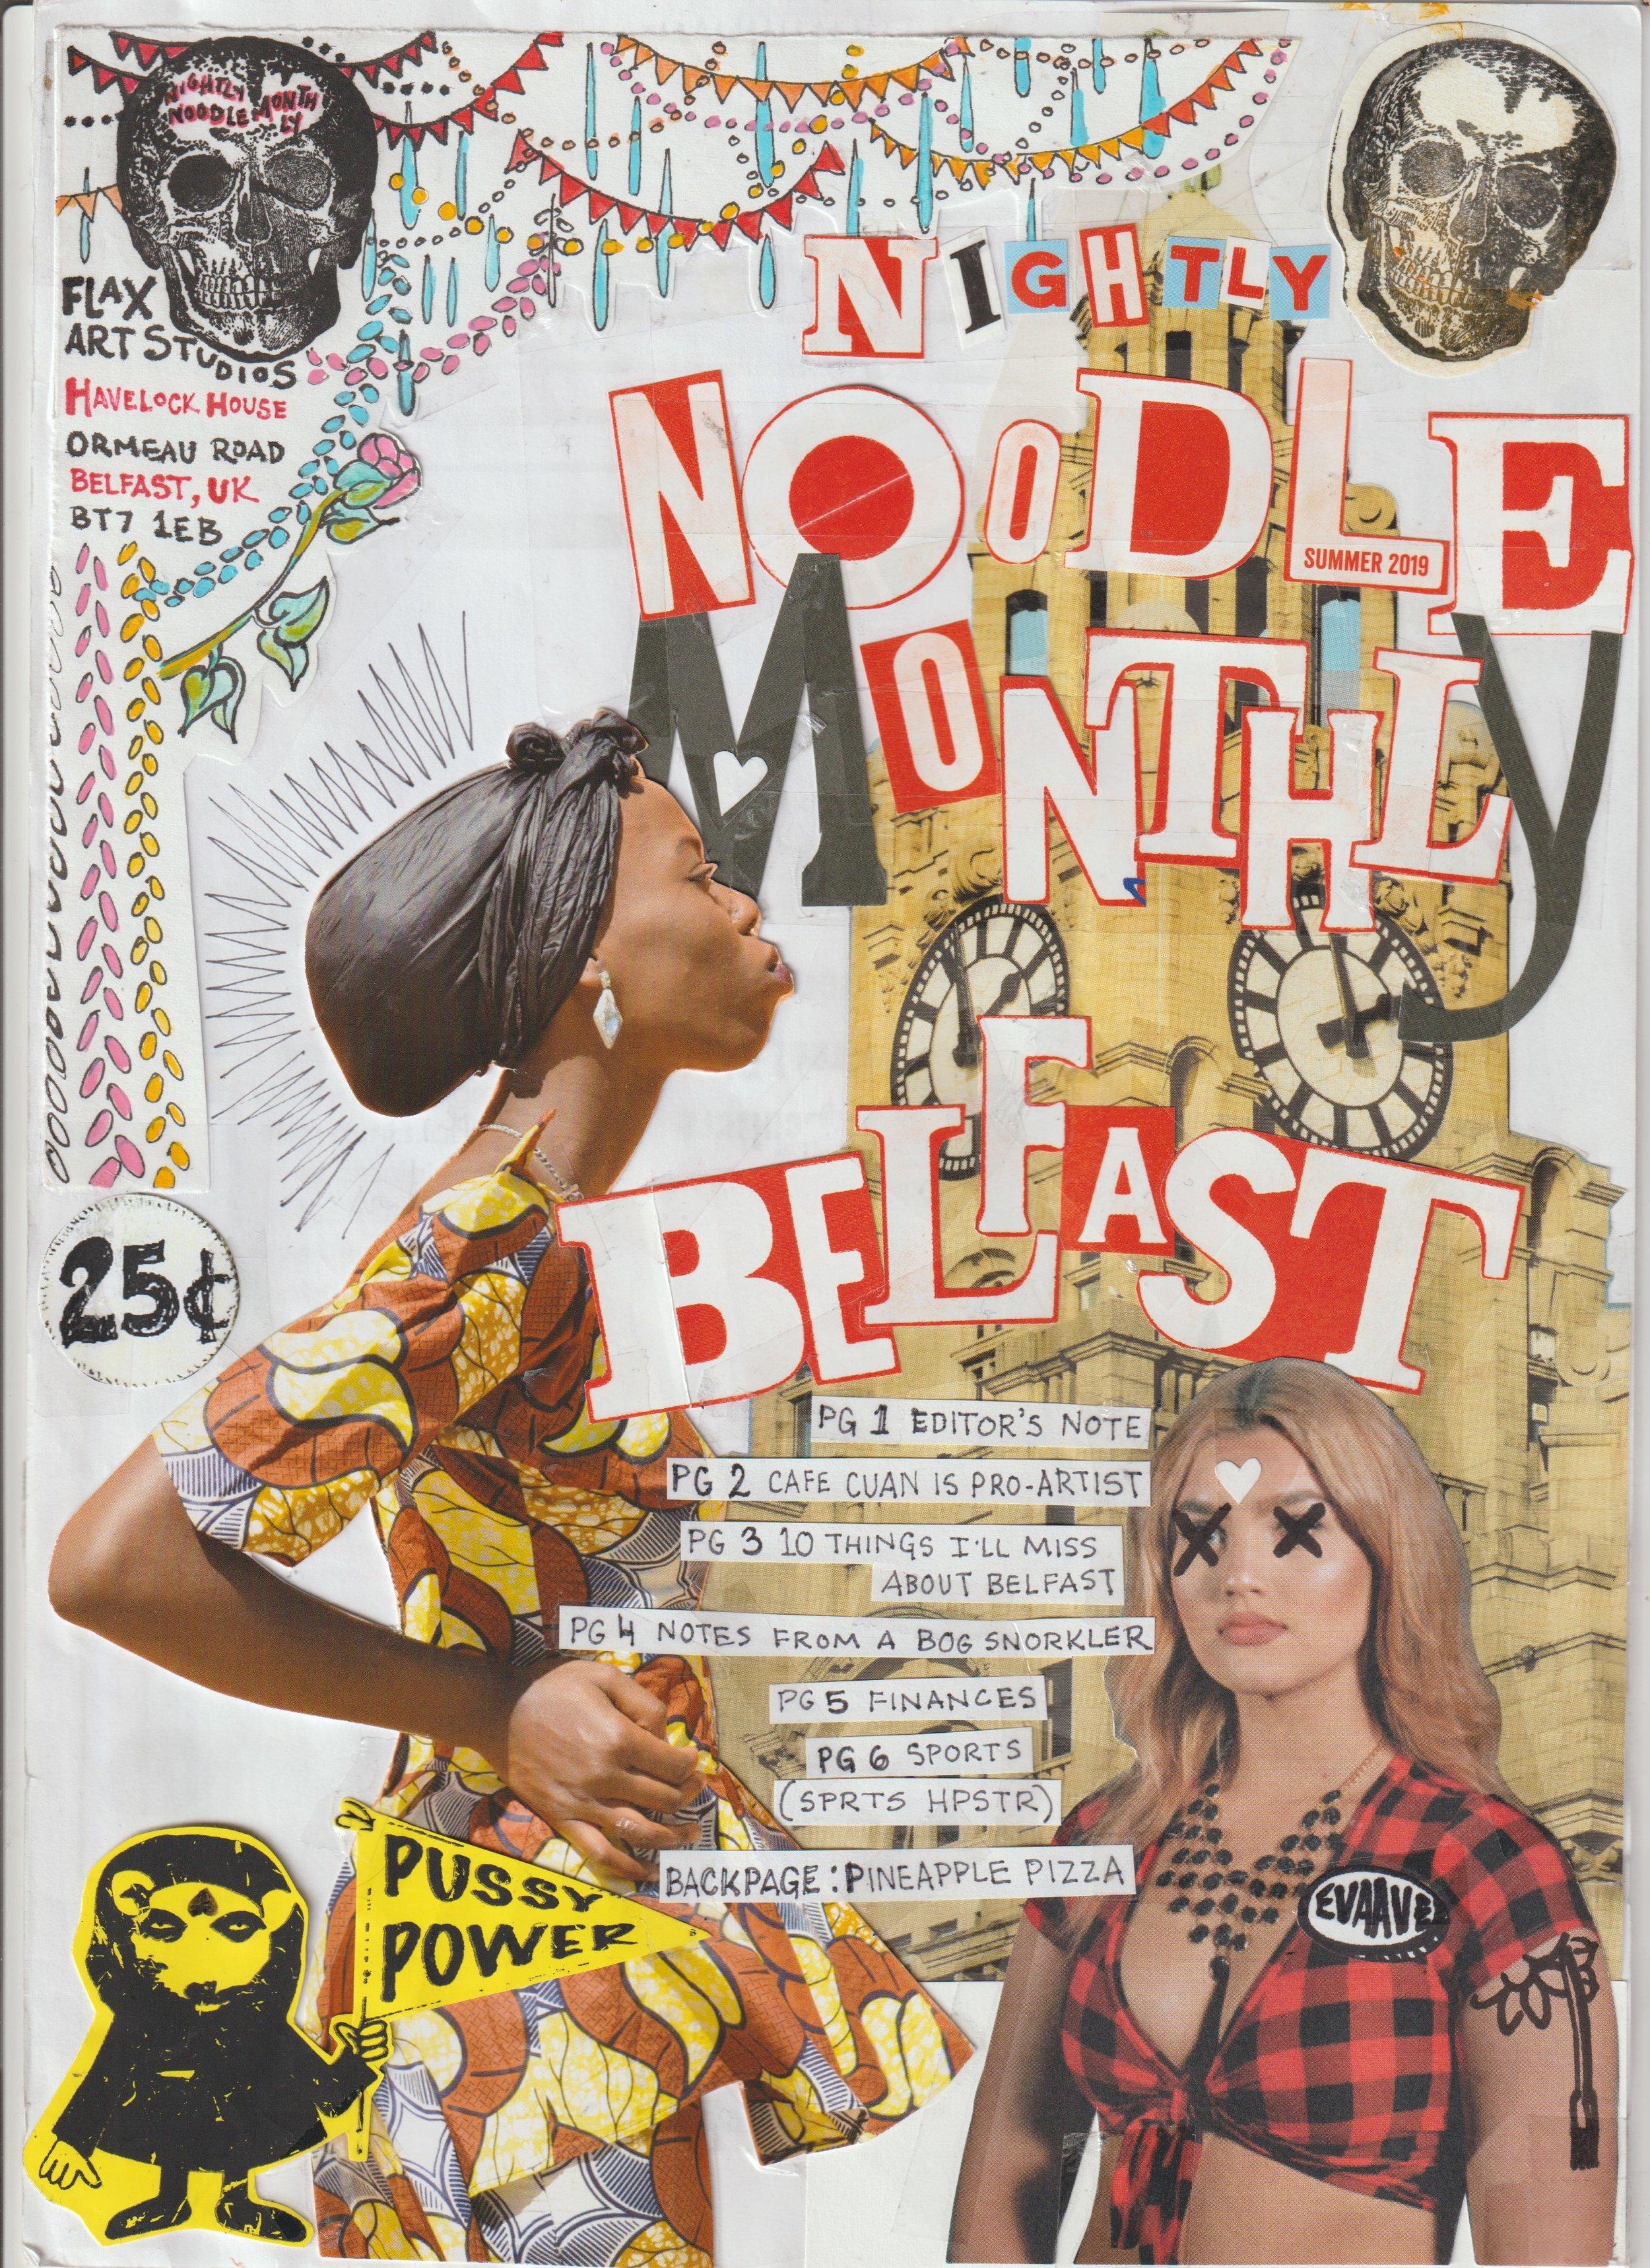 Belfast Noodle COVER.jpg